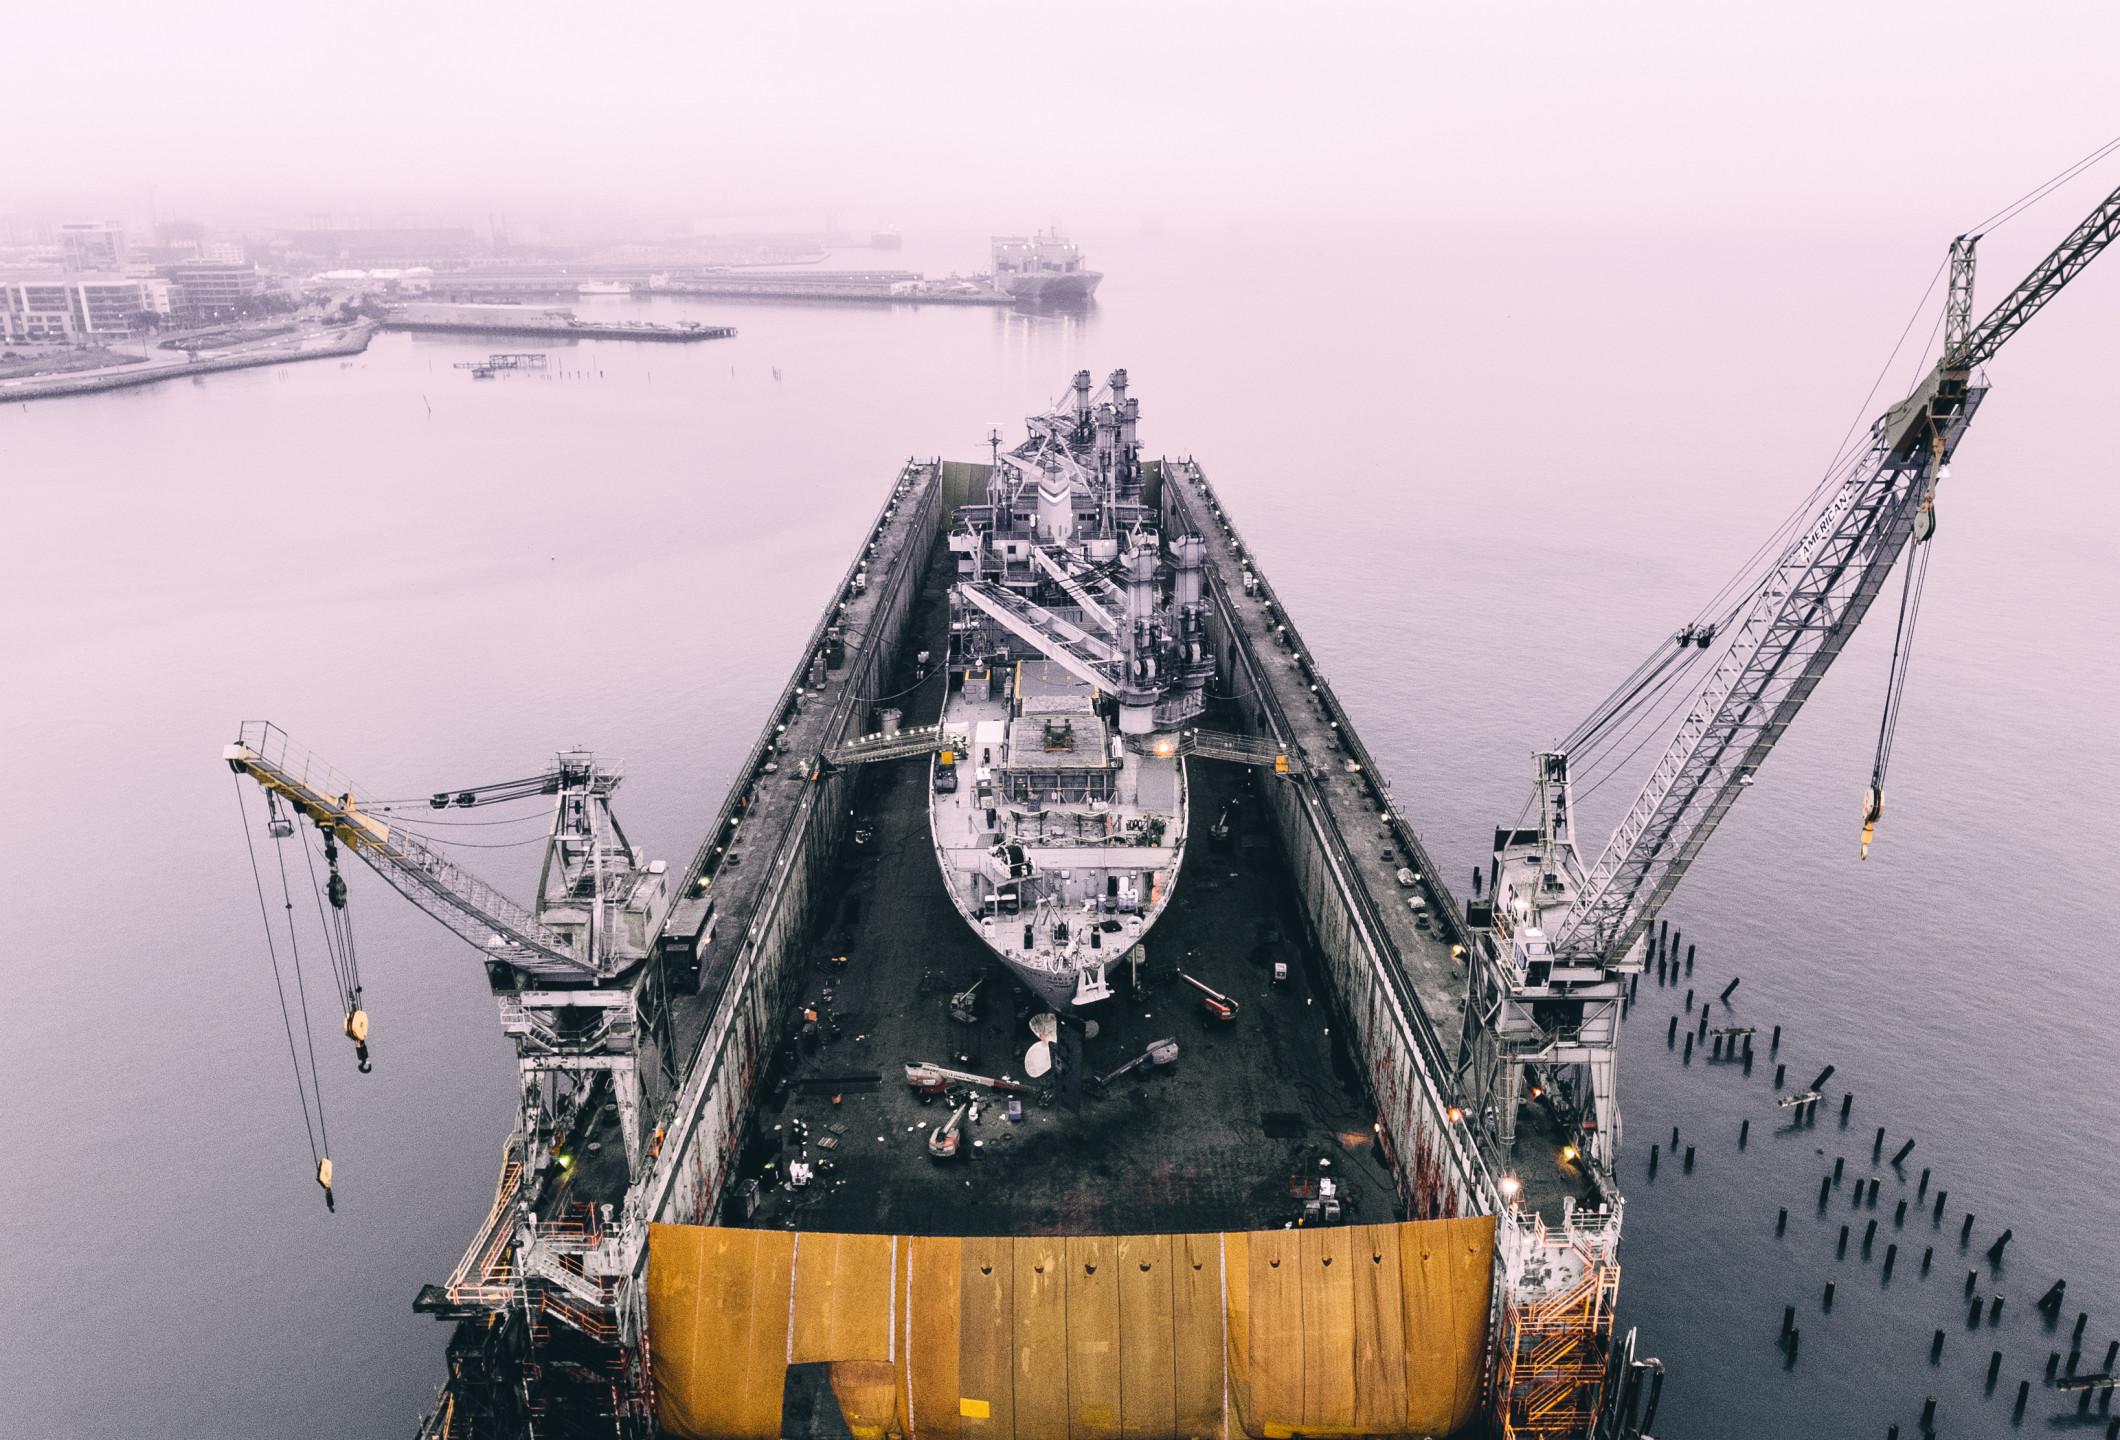 Crude oil price forecast - XBRUSD rises slightly to 67.89